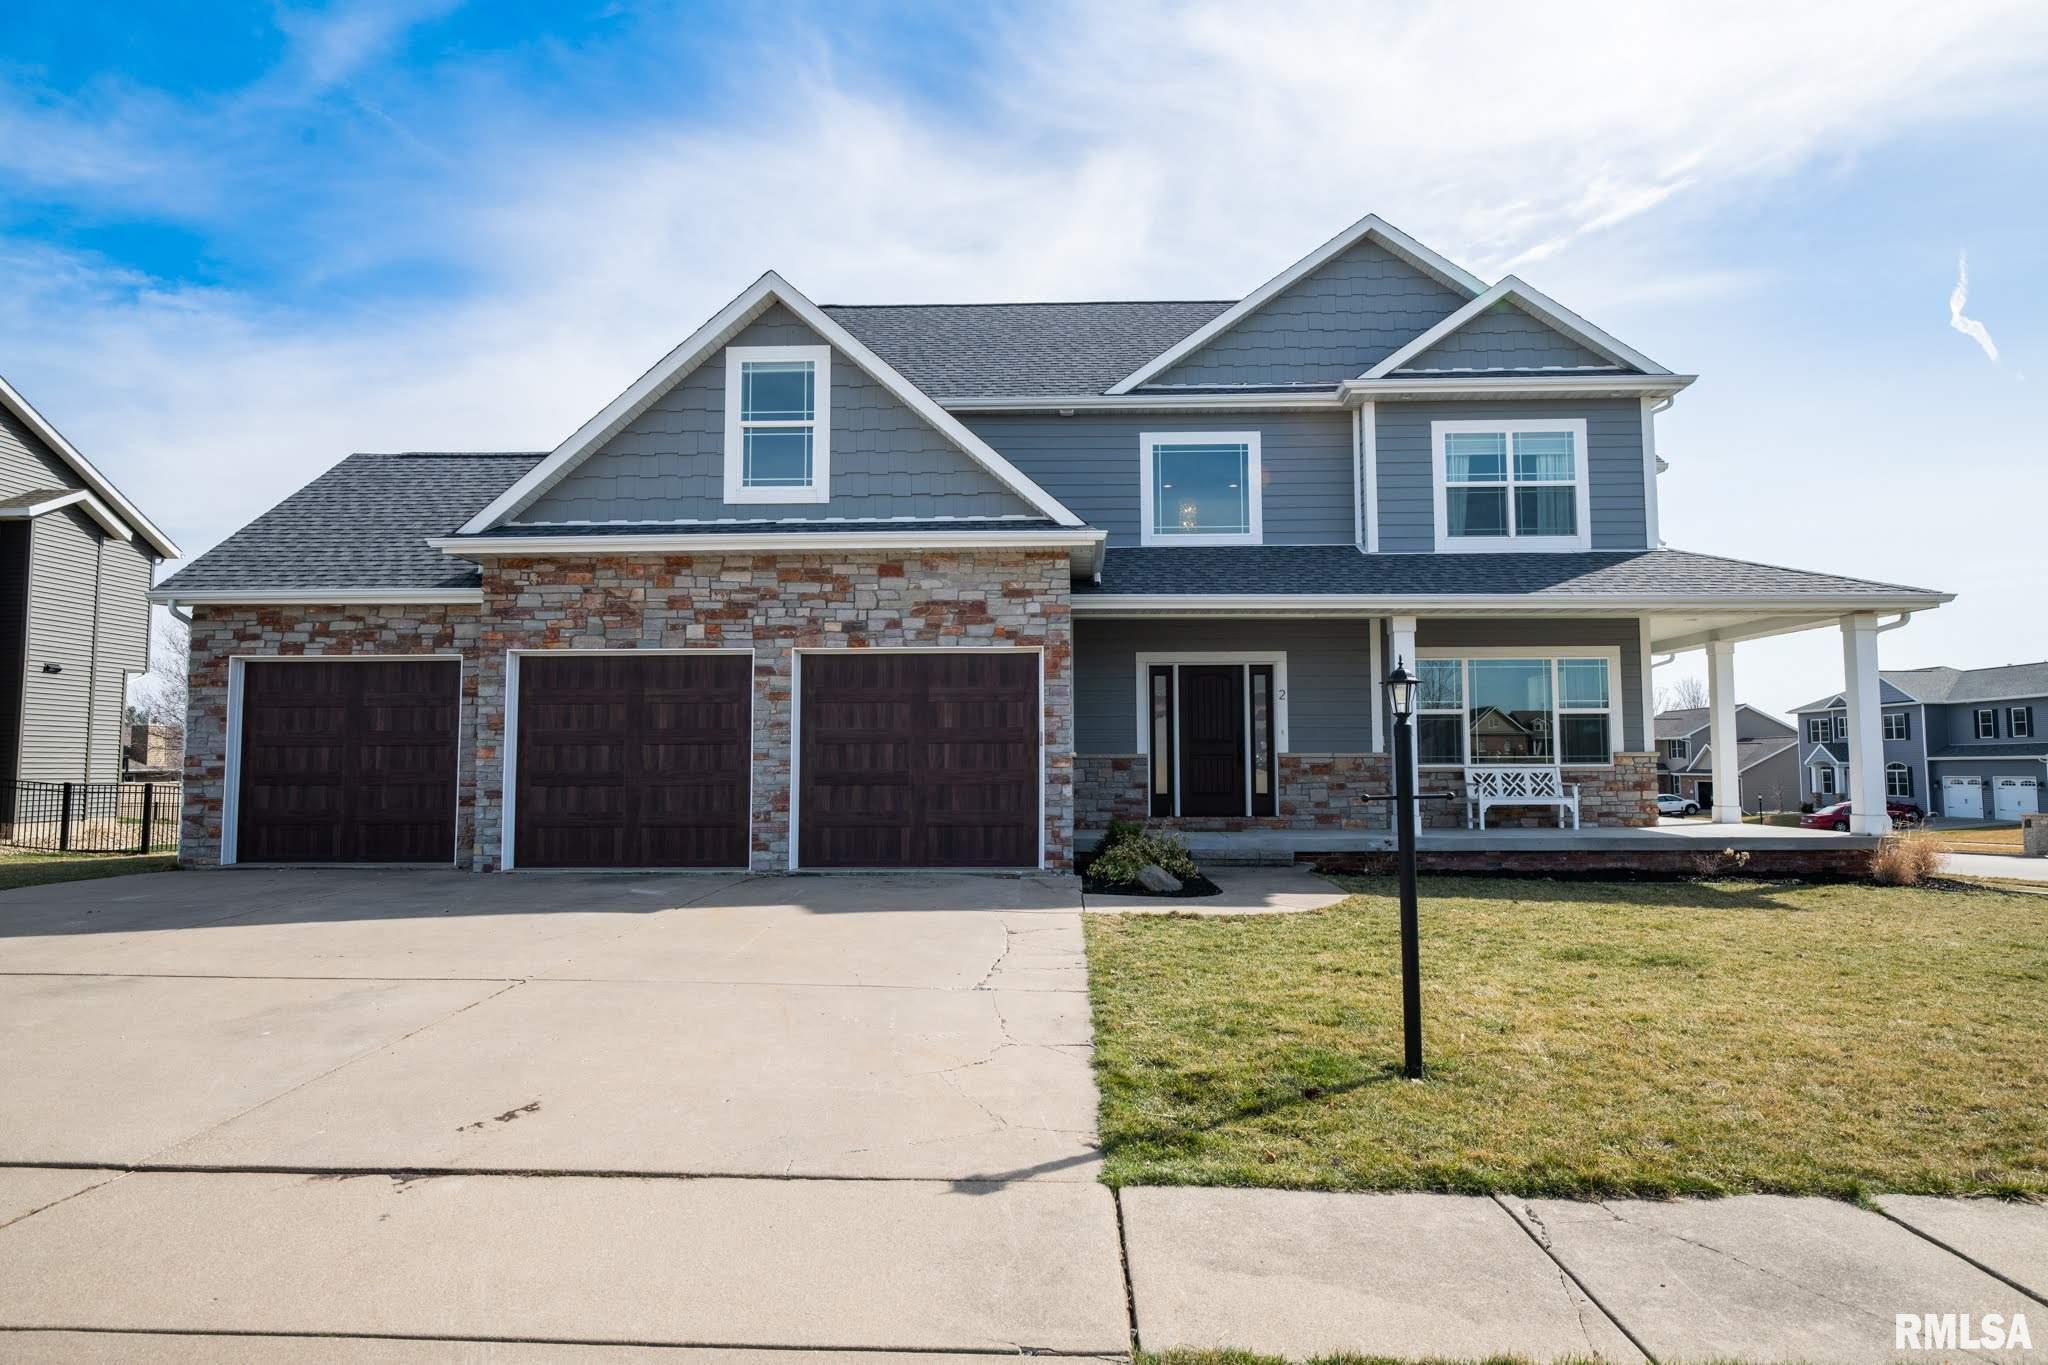 2 HOLBORN Property Photo - Washington, IL real estate listing